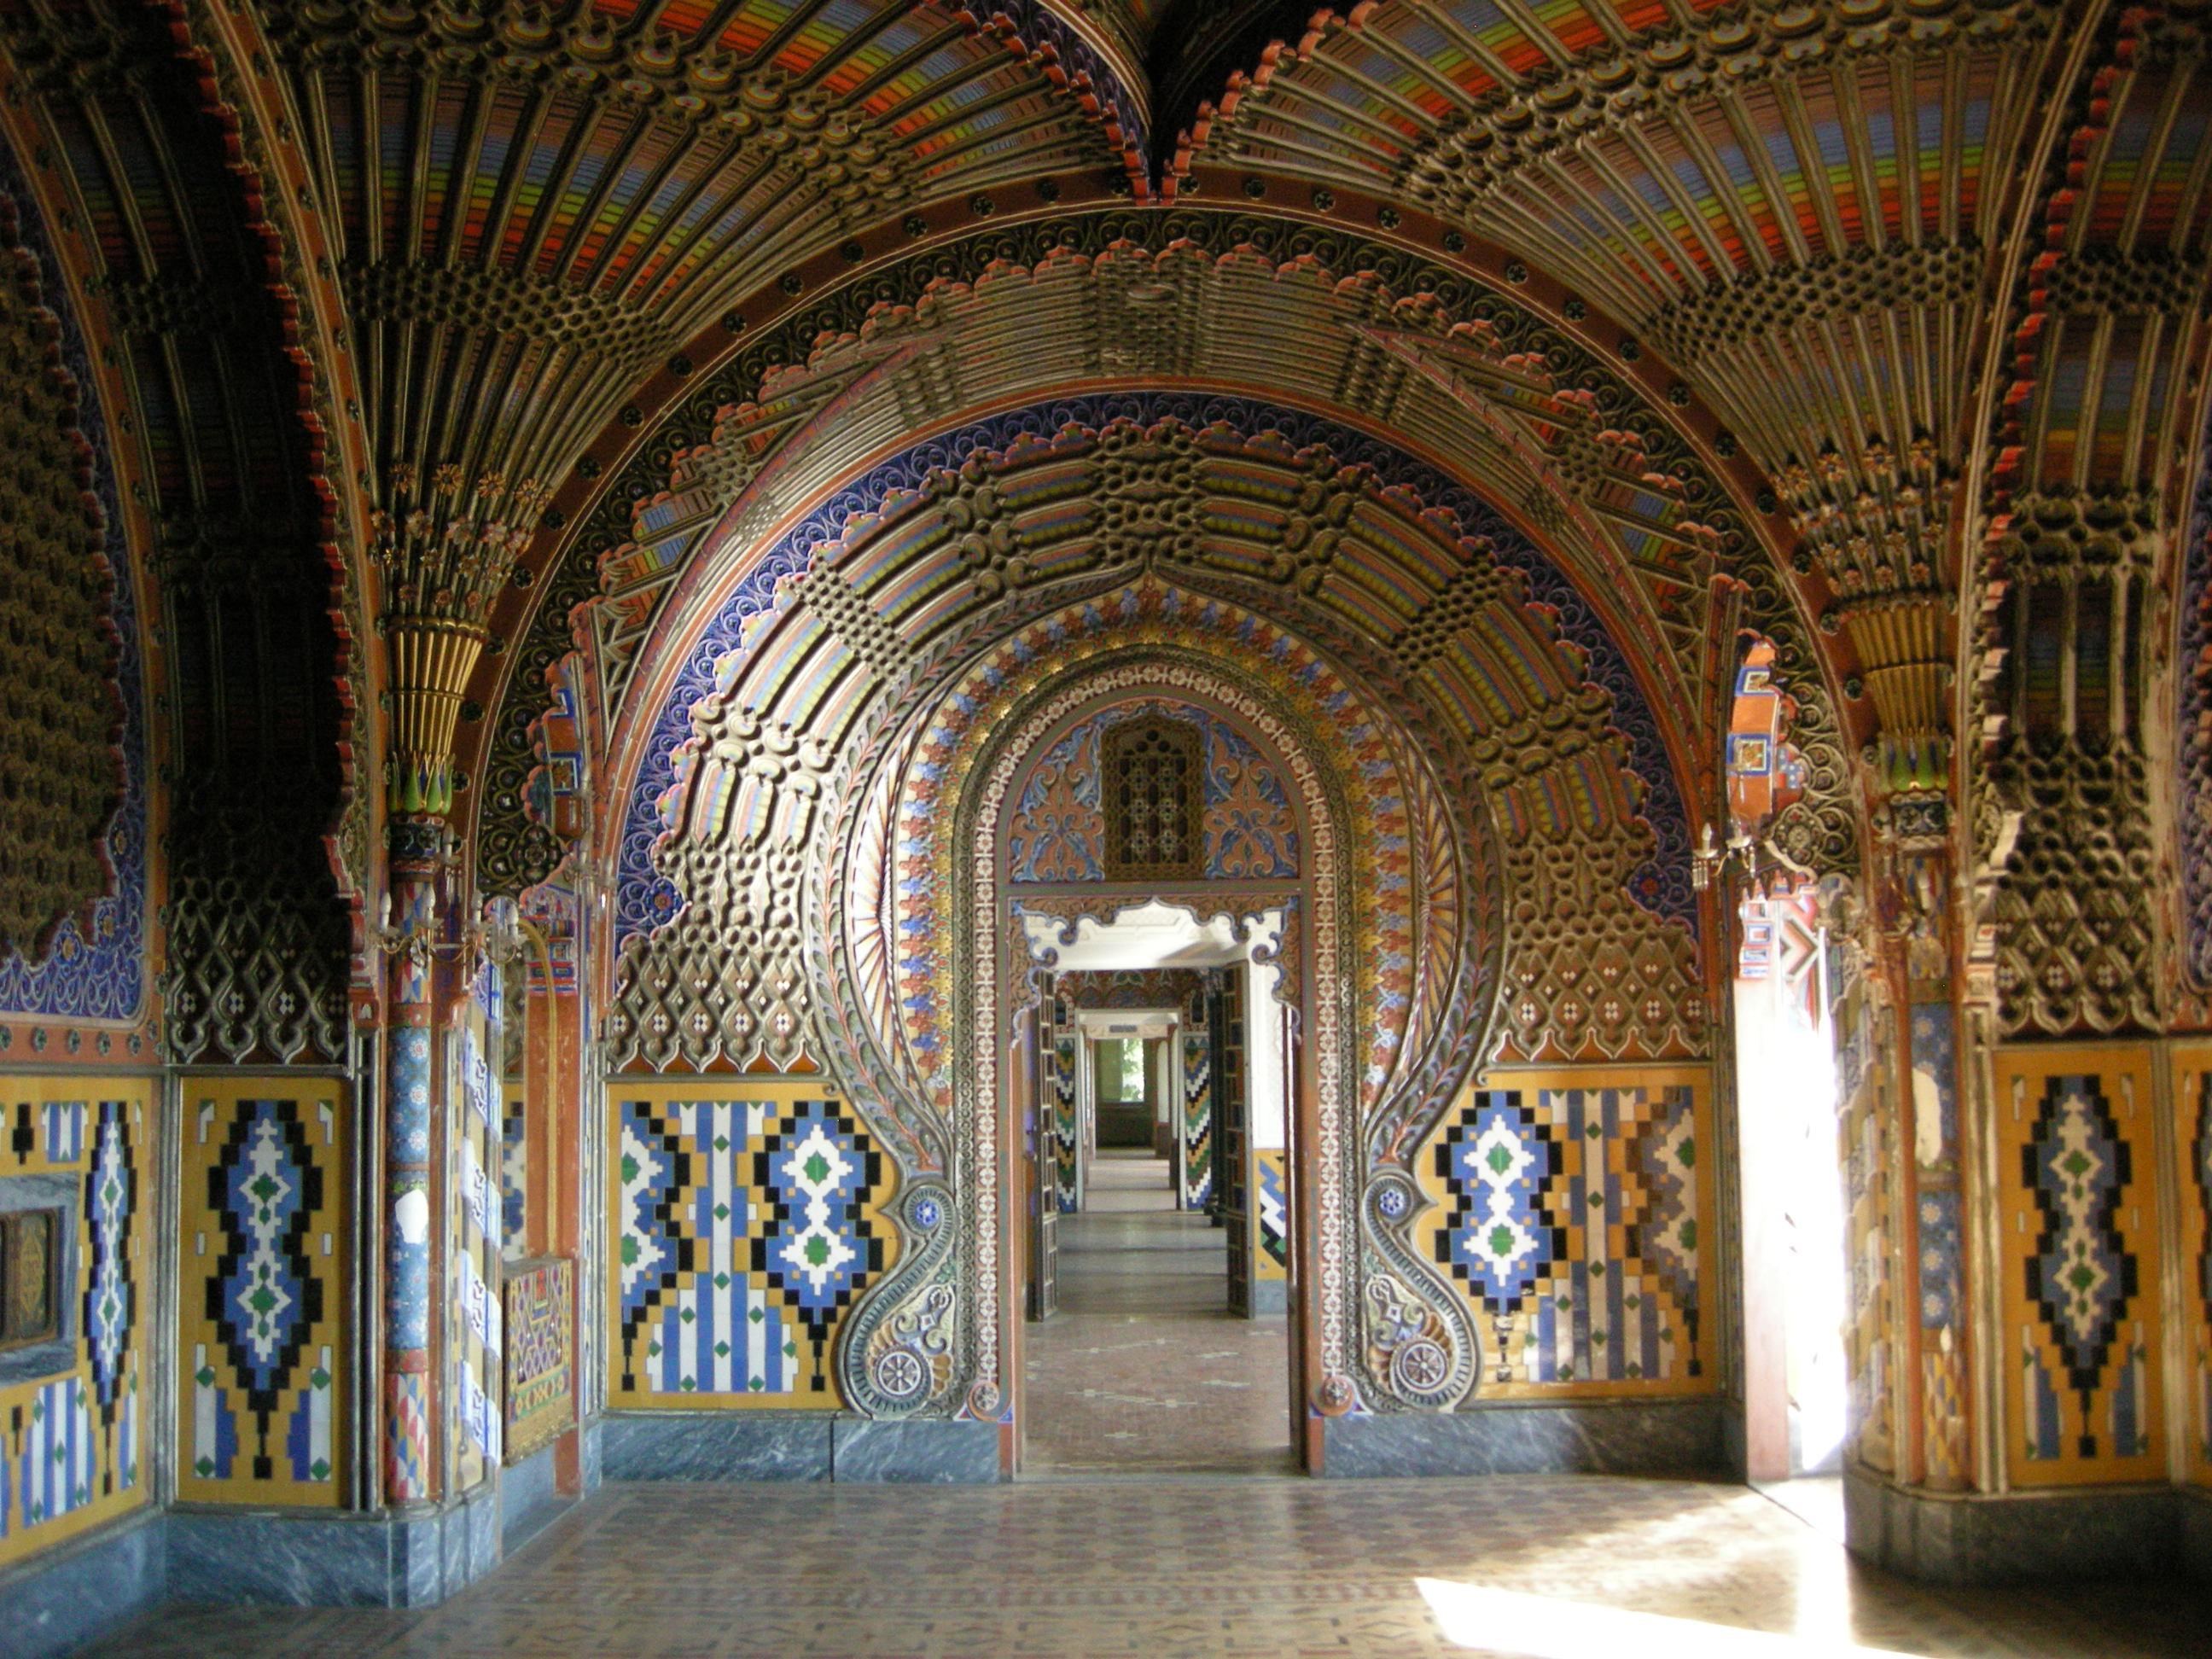 castello sammezzano, sala pavoni